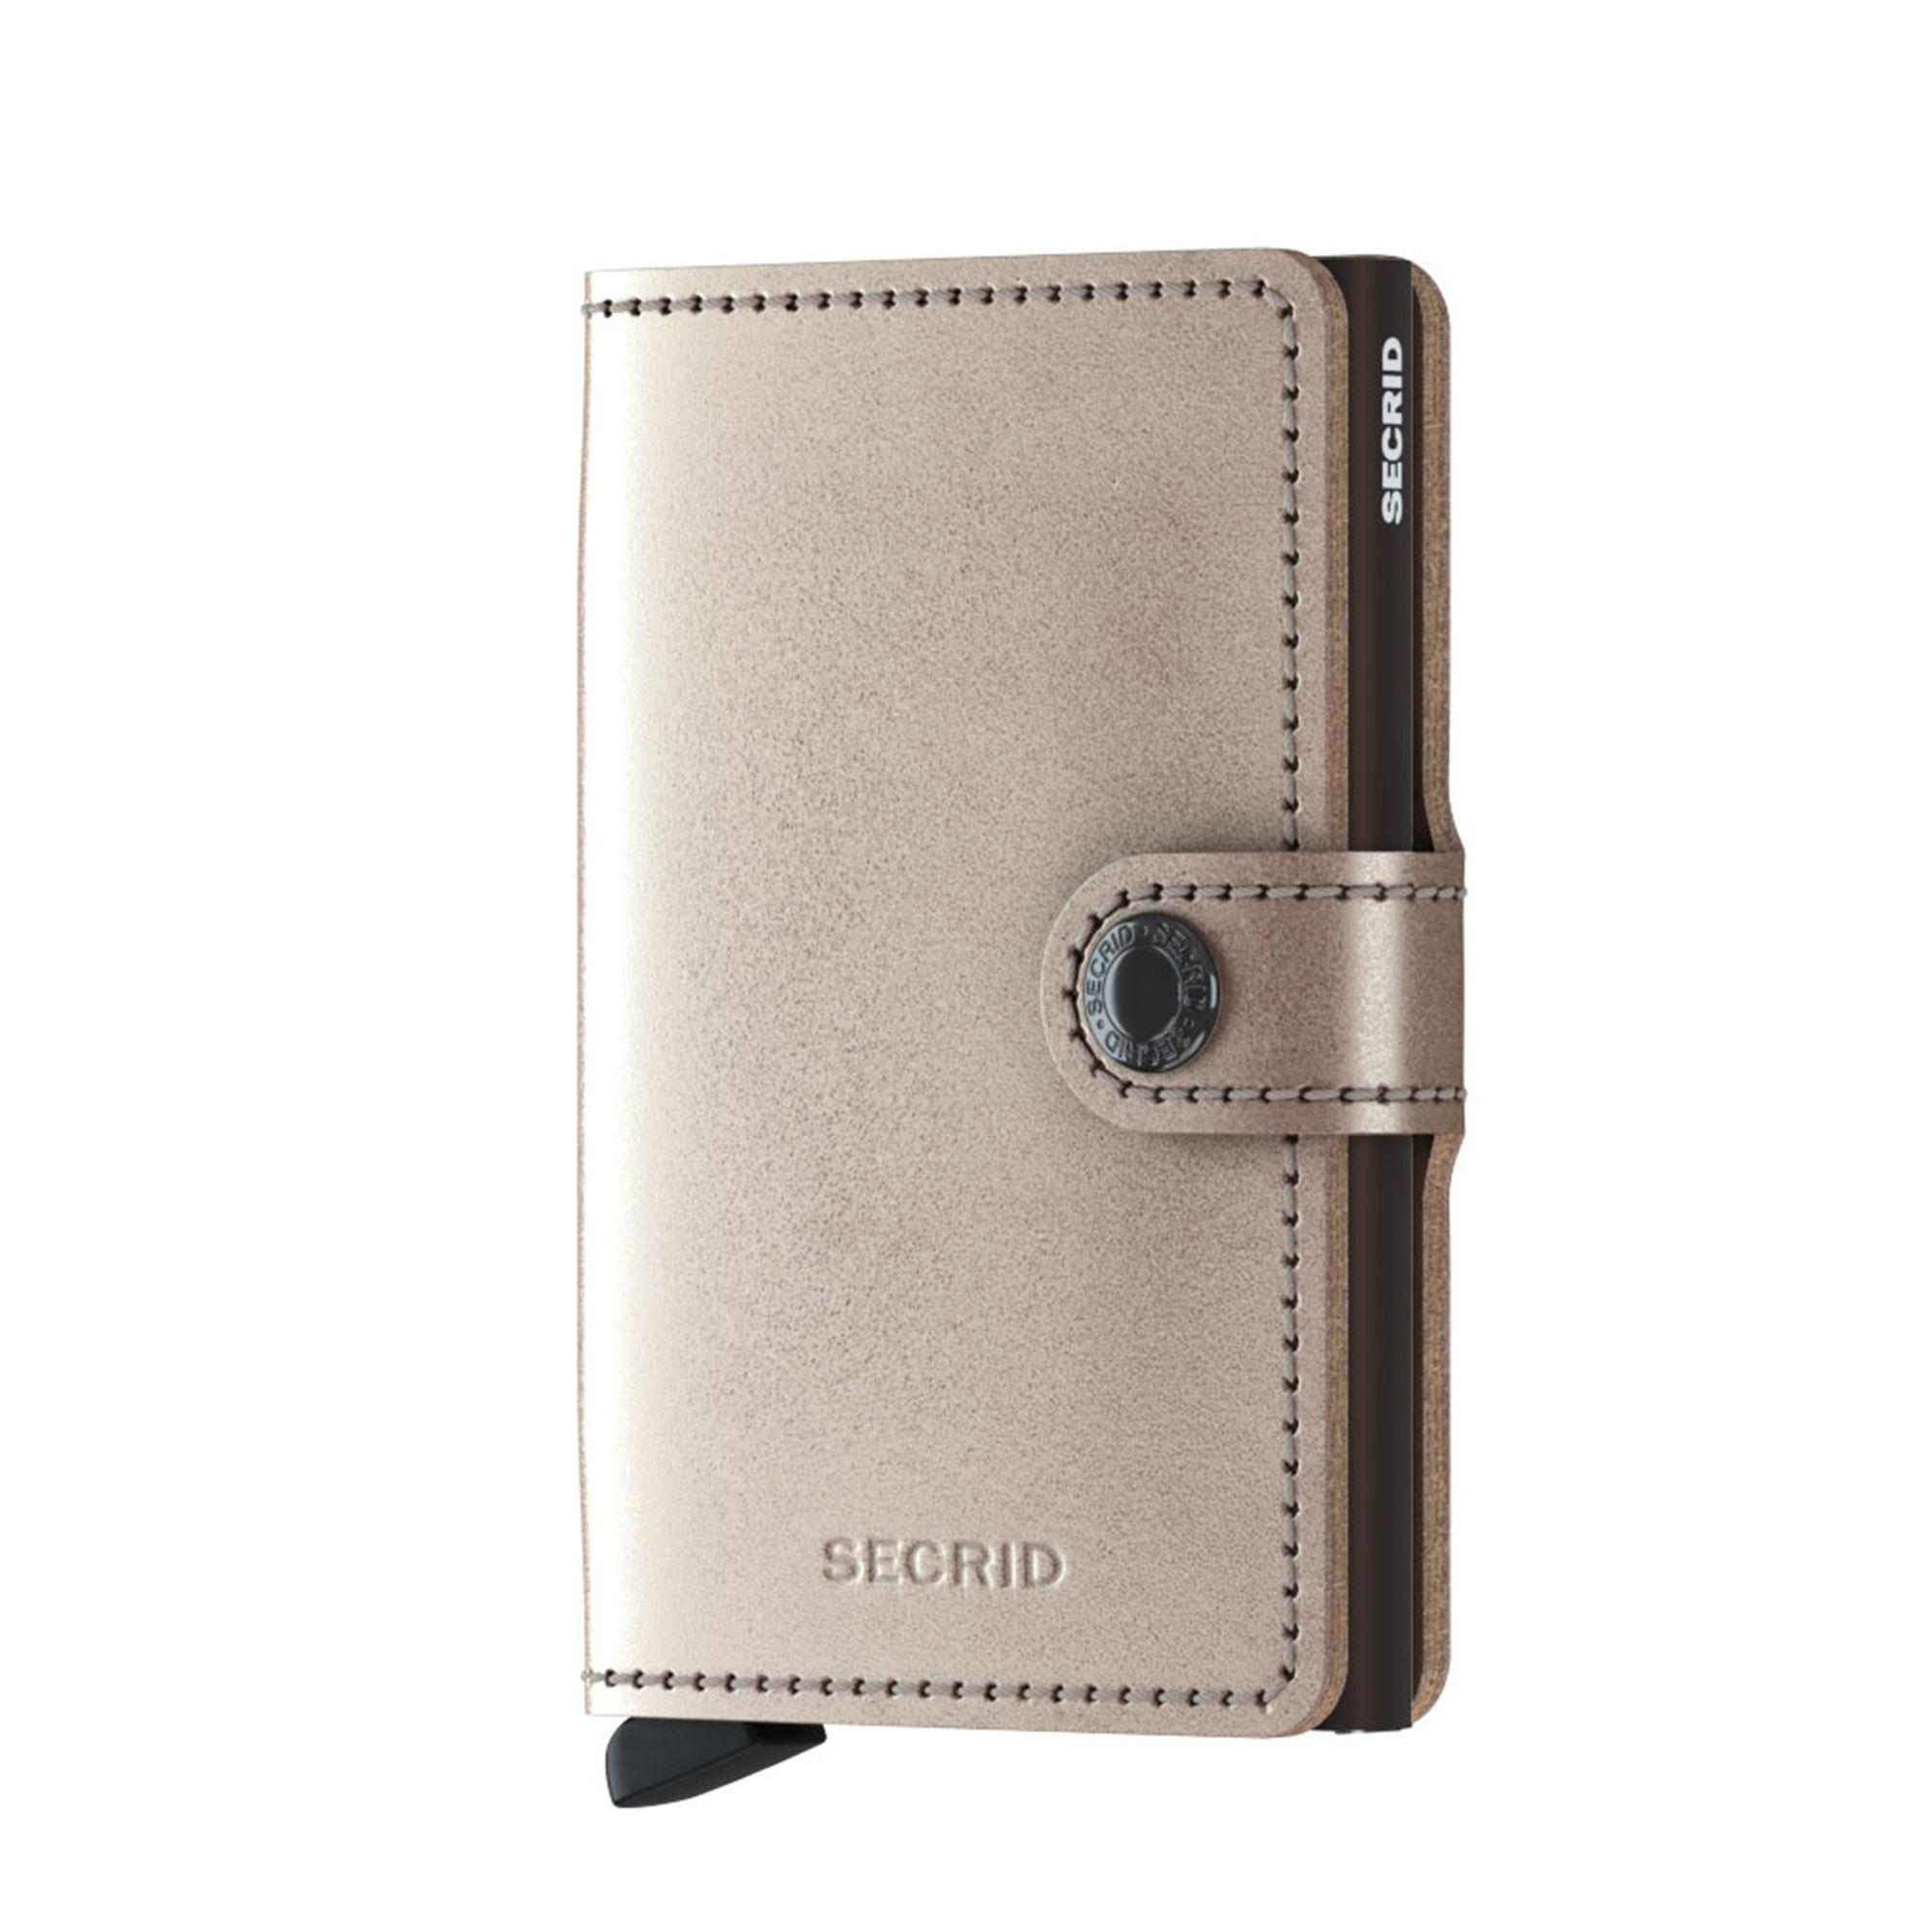 Secrid Miniwallet liten plånbok, Champagne